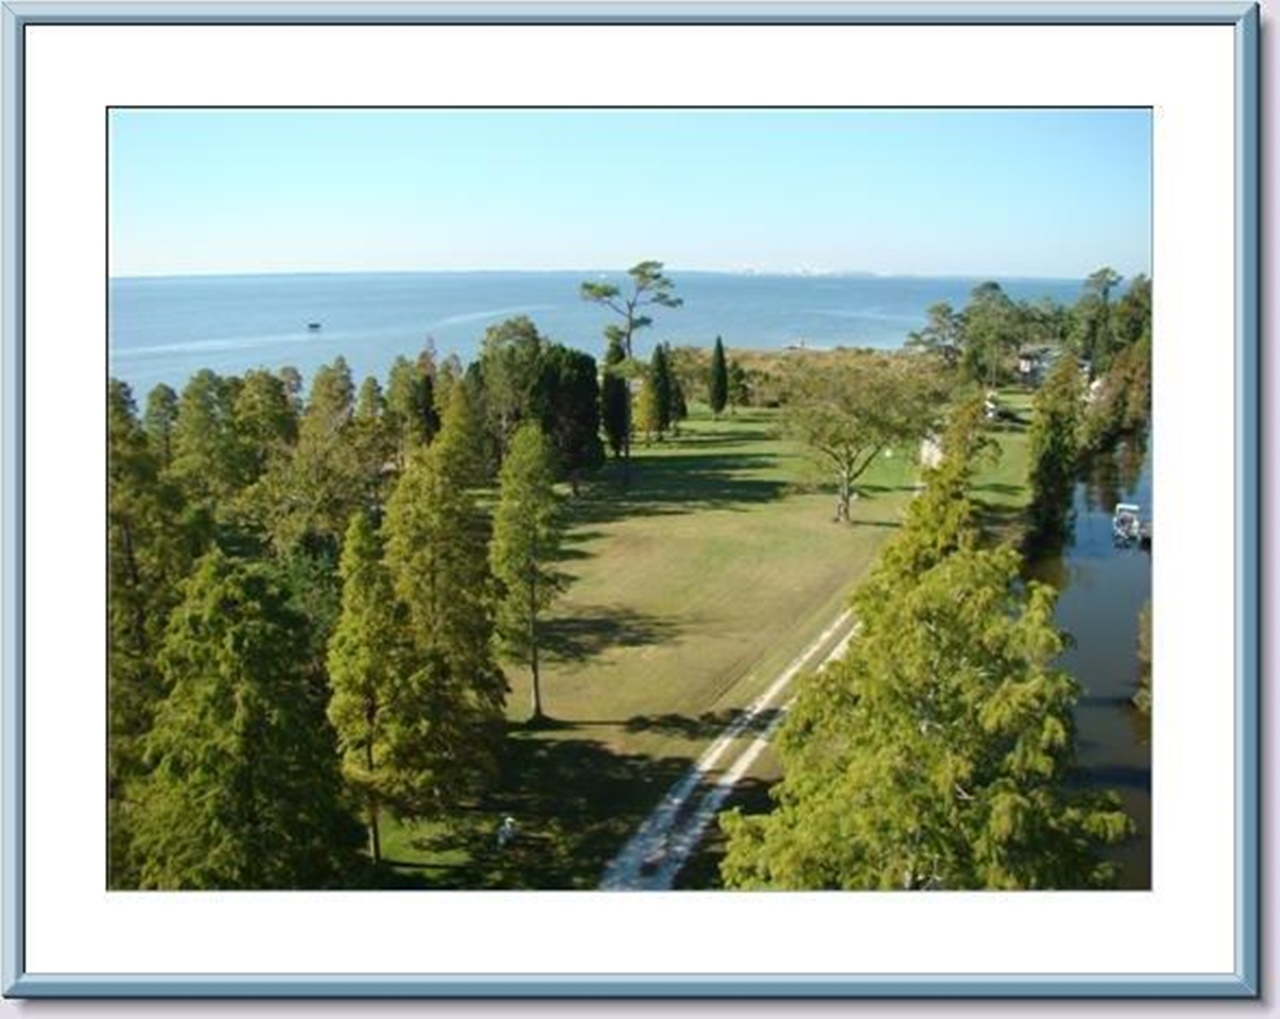 92 Wide Waters Dr., Bath, North Carolina 27808